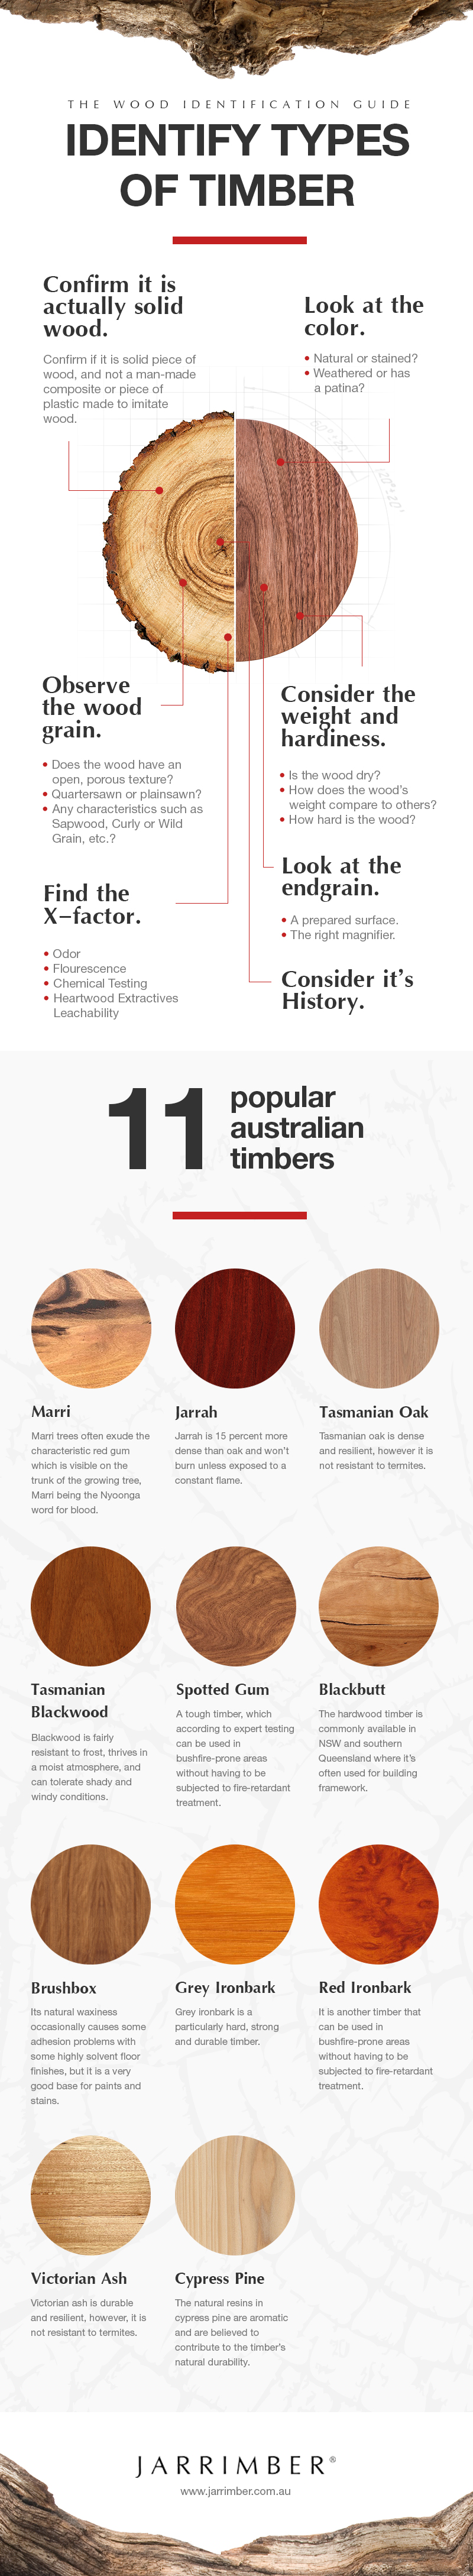 Timber Identification Guide - Jarrimber